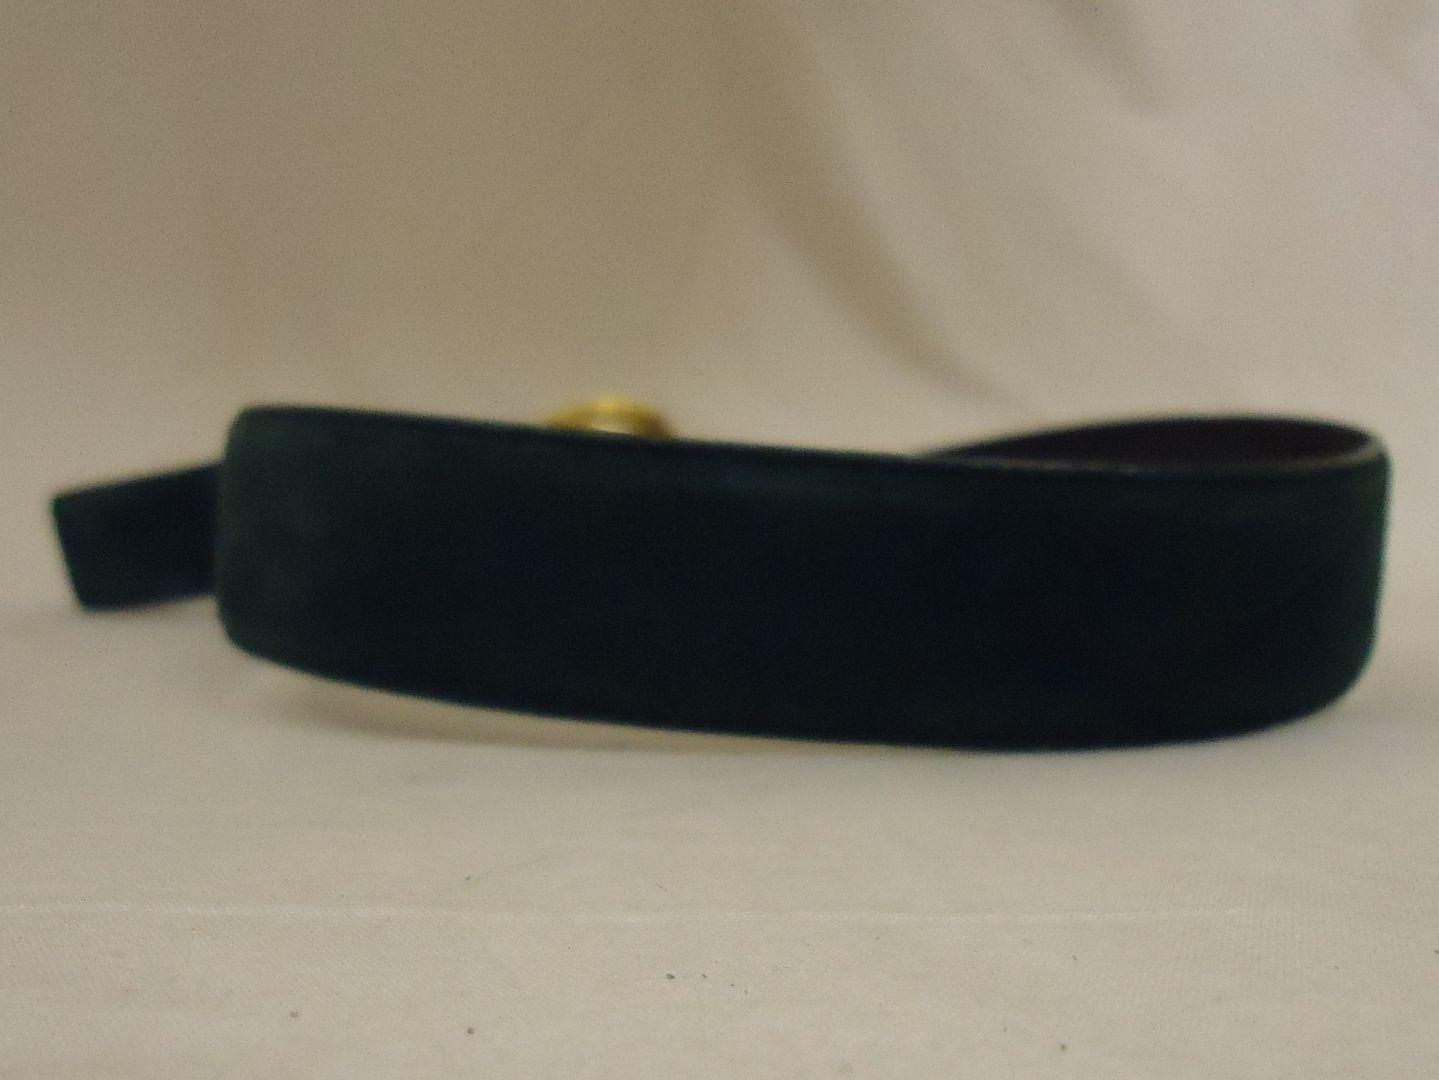 ar7925 100212-246m Designer Belt 26.5in-30.5in Gold Buckle Suede Female Adult M Greens Solid 5082